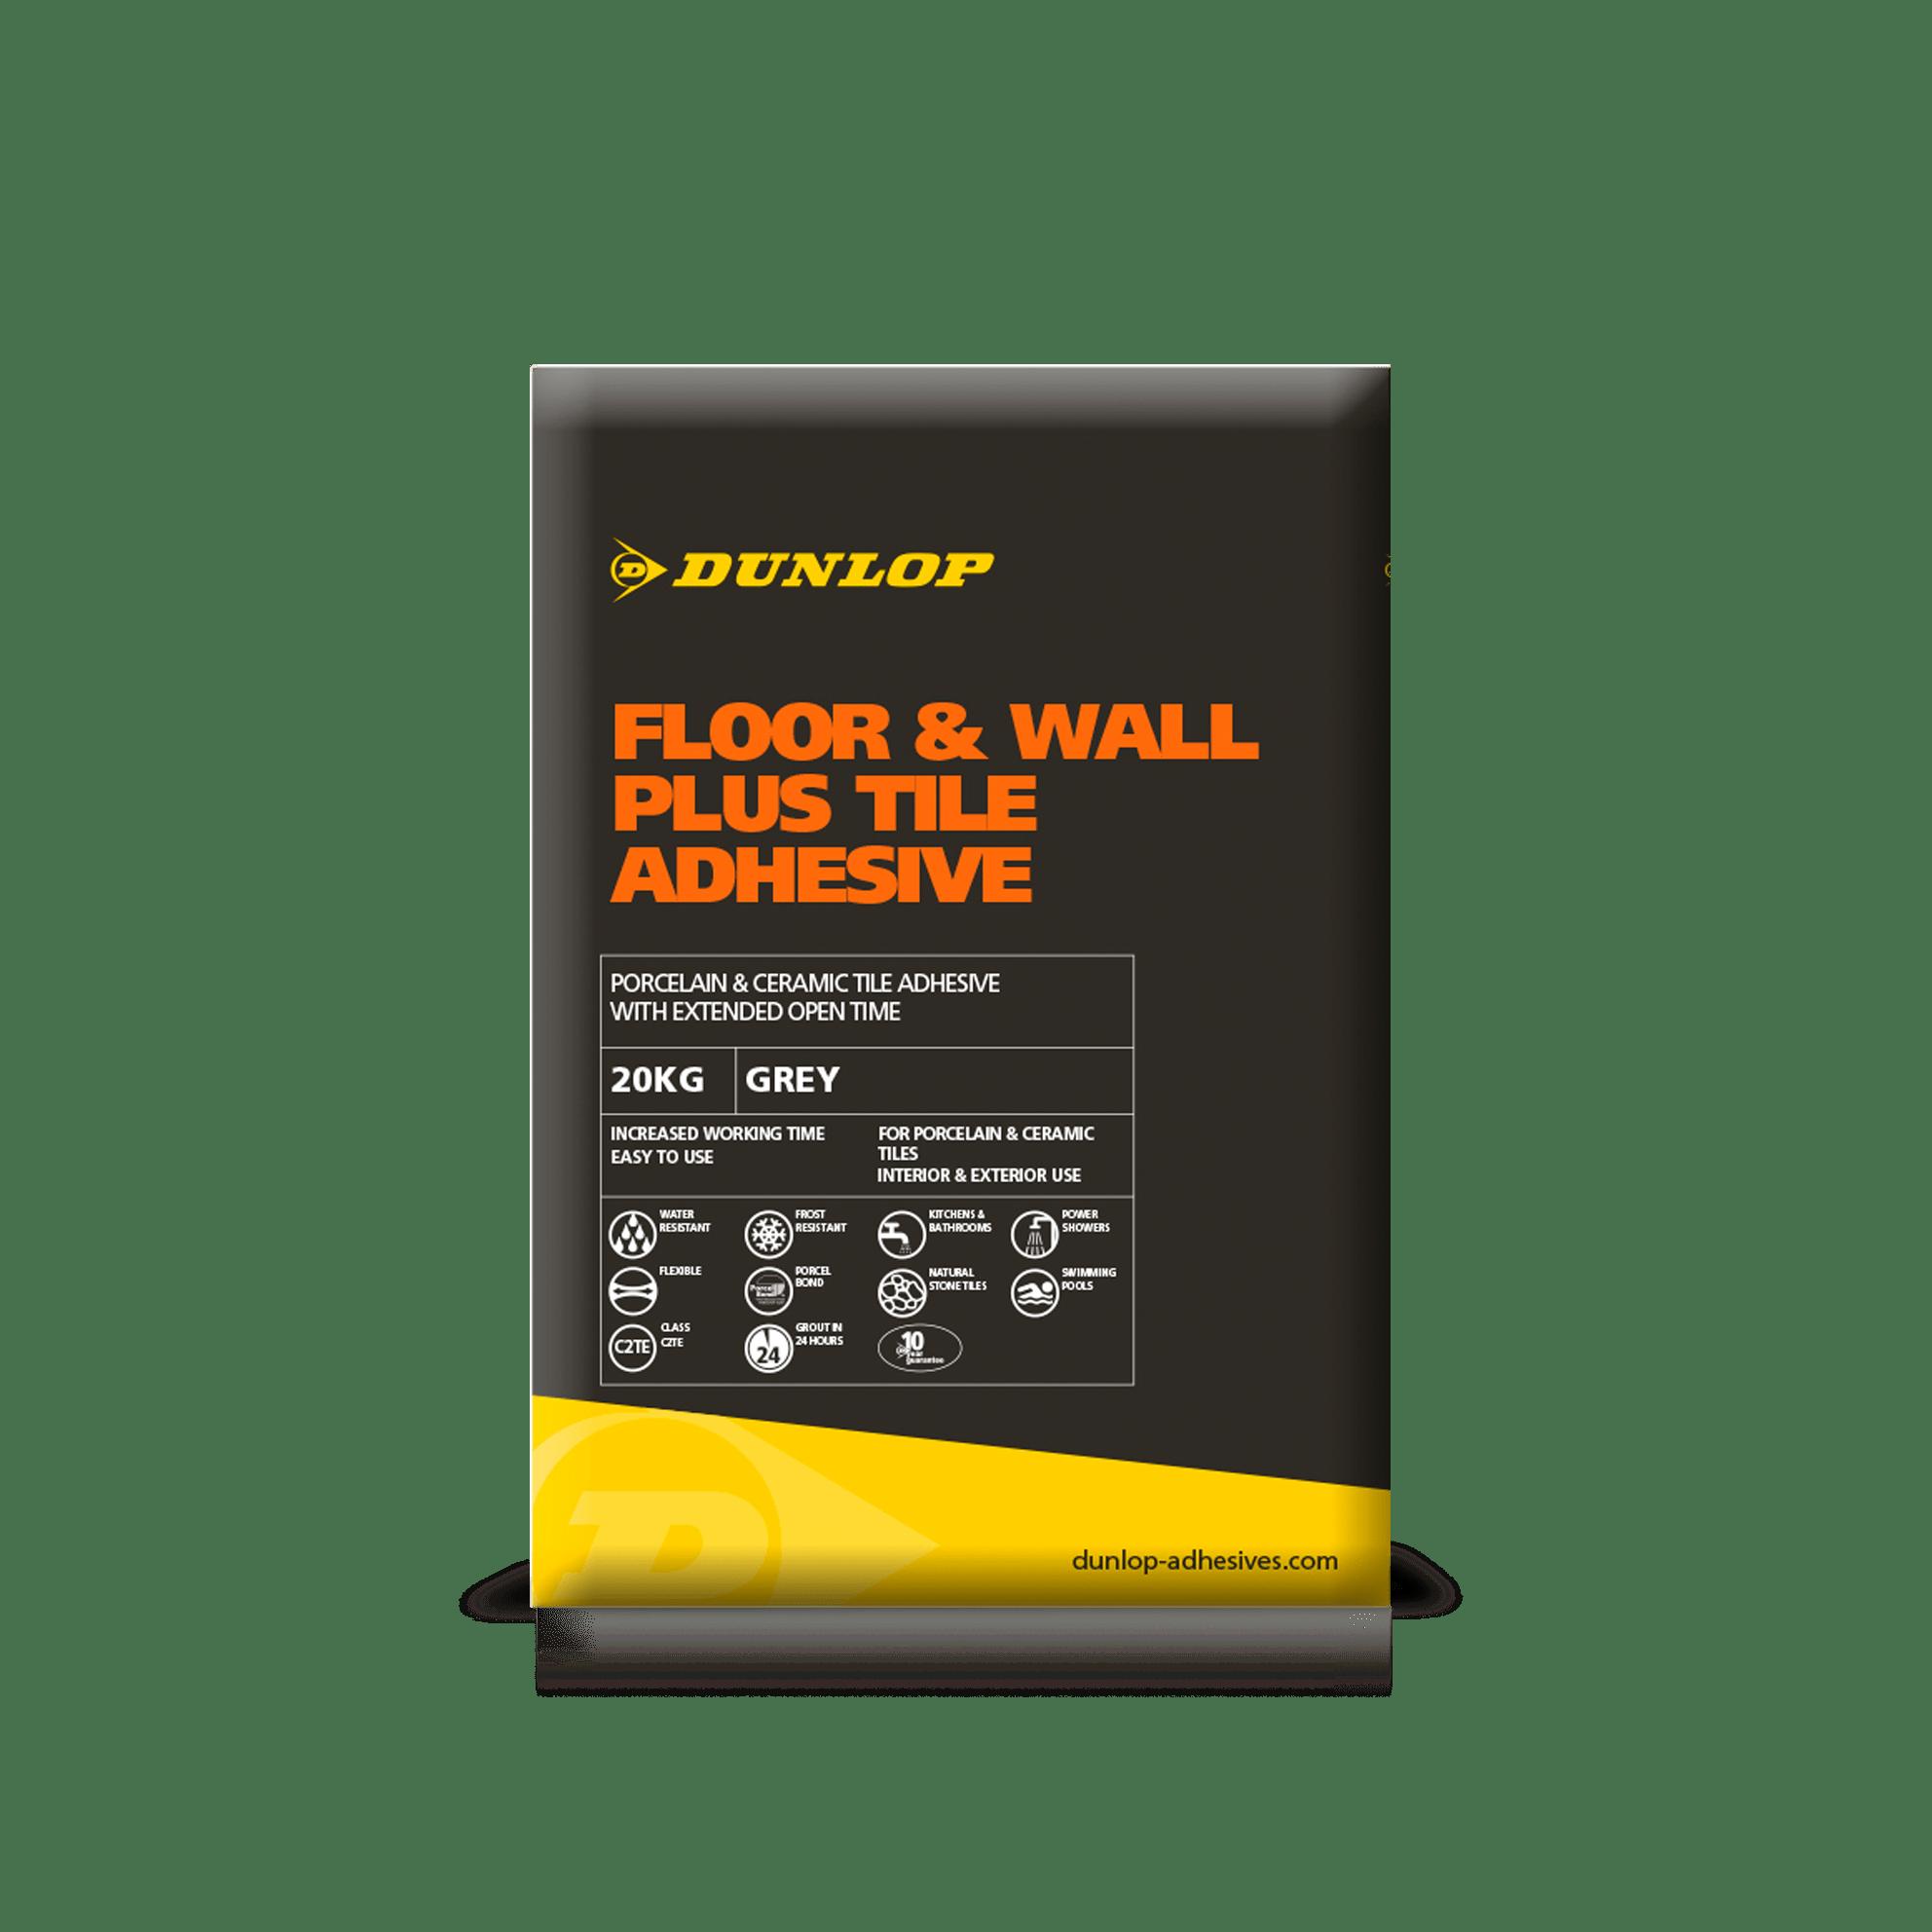 Floor Amp Wall Plus Tile Adhesives Dunlop Trade